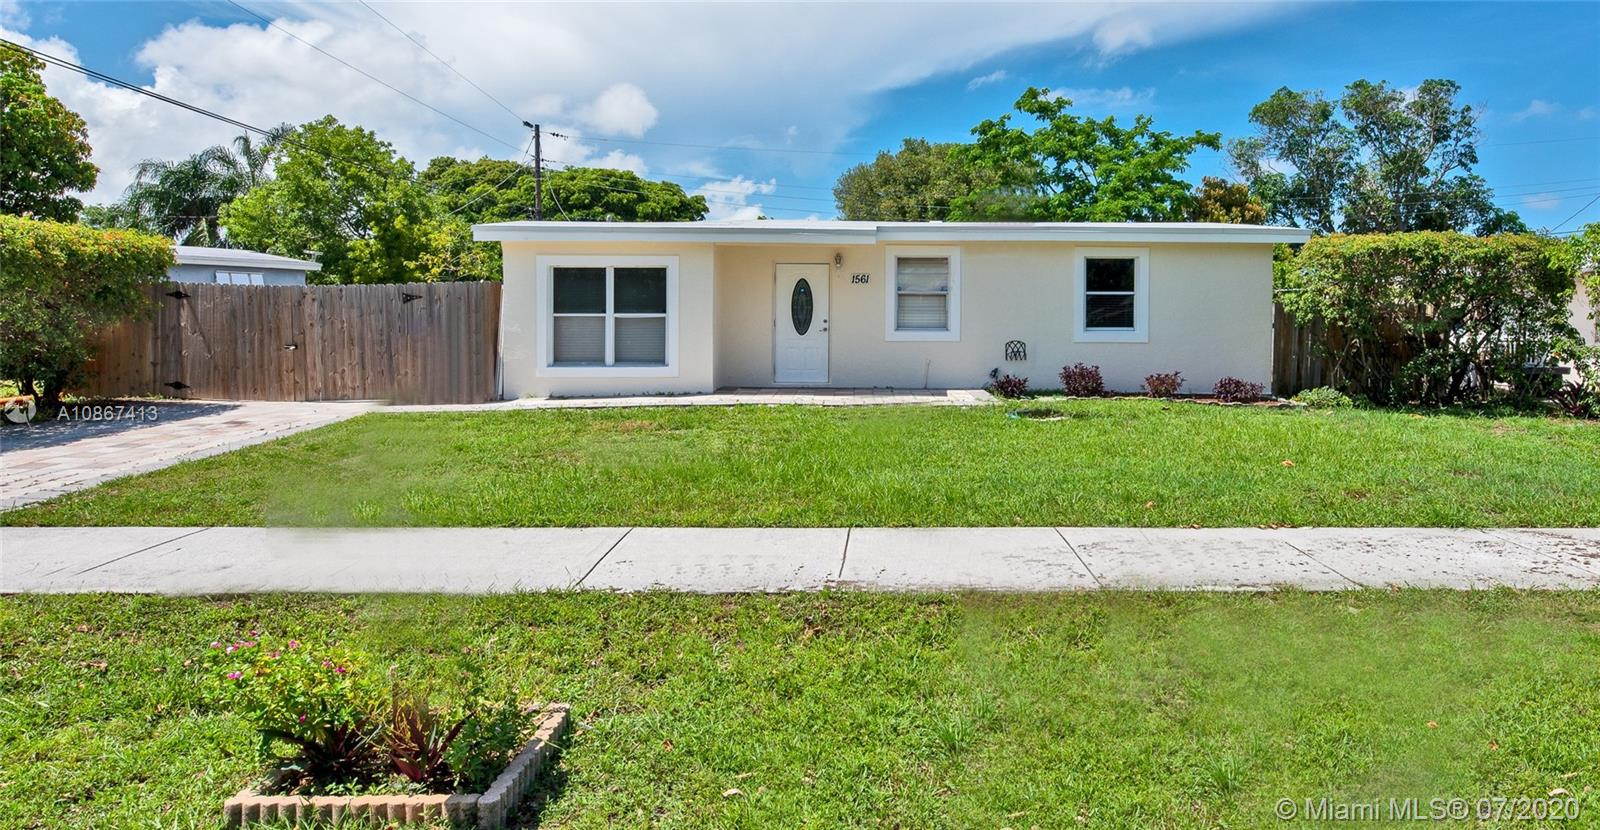 1561 NE 47th Ct Property Photo - Pompano Beach, FL real estate listing